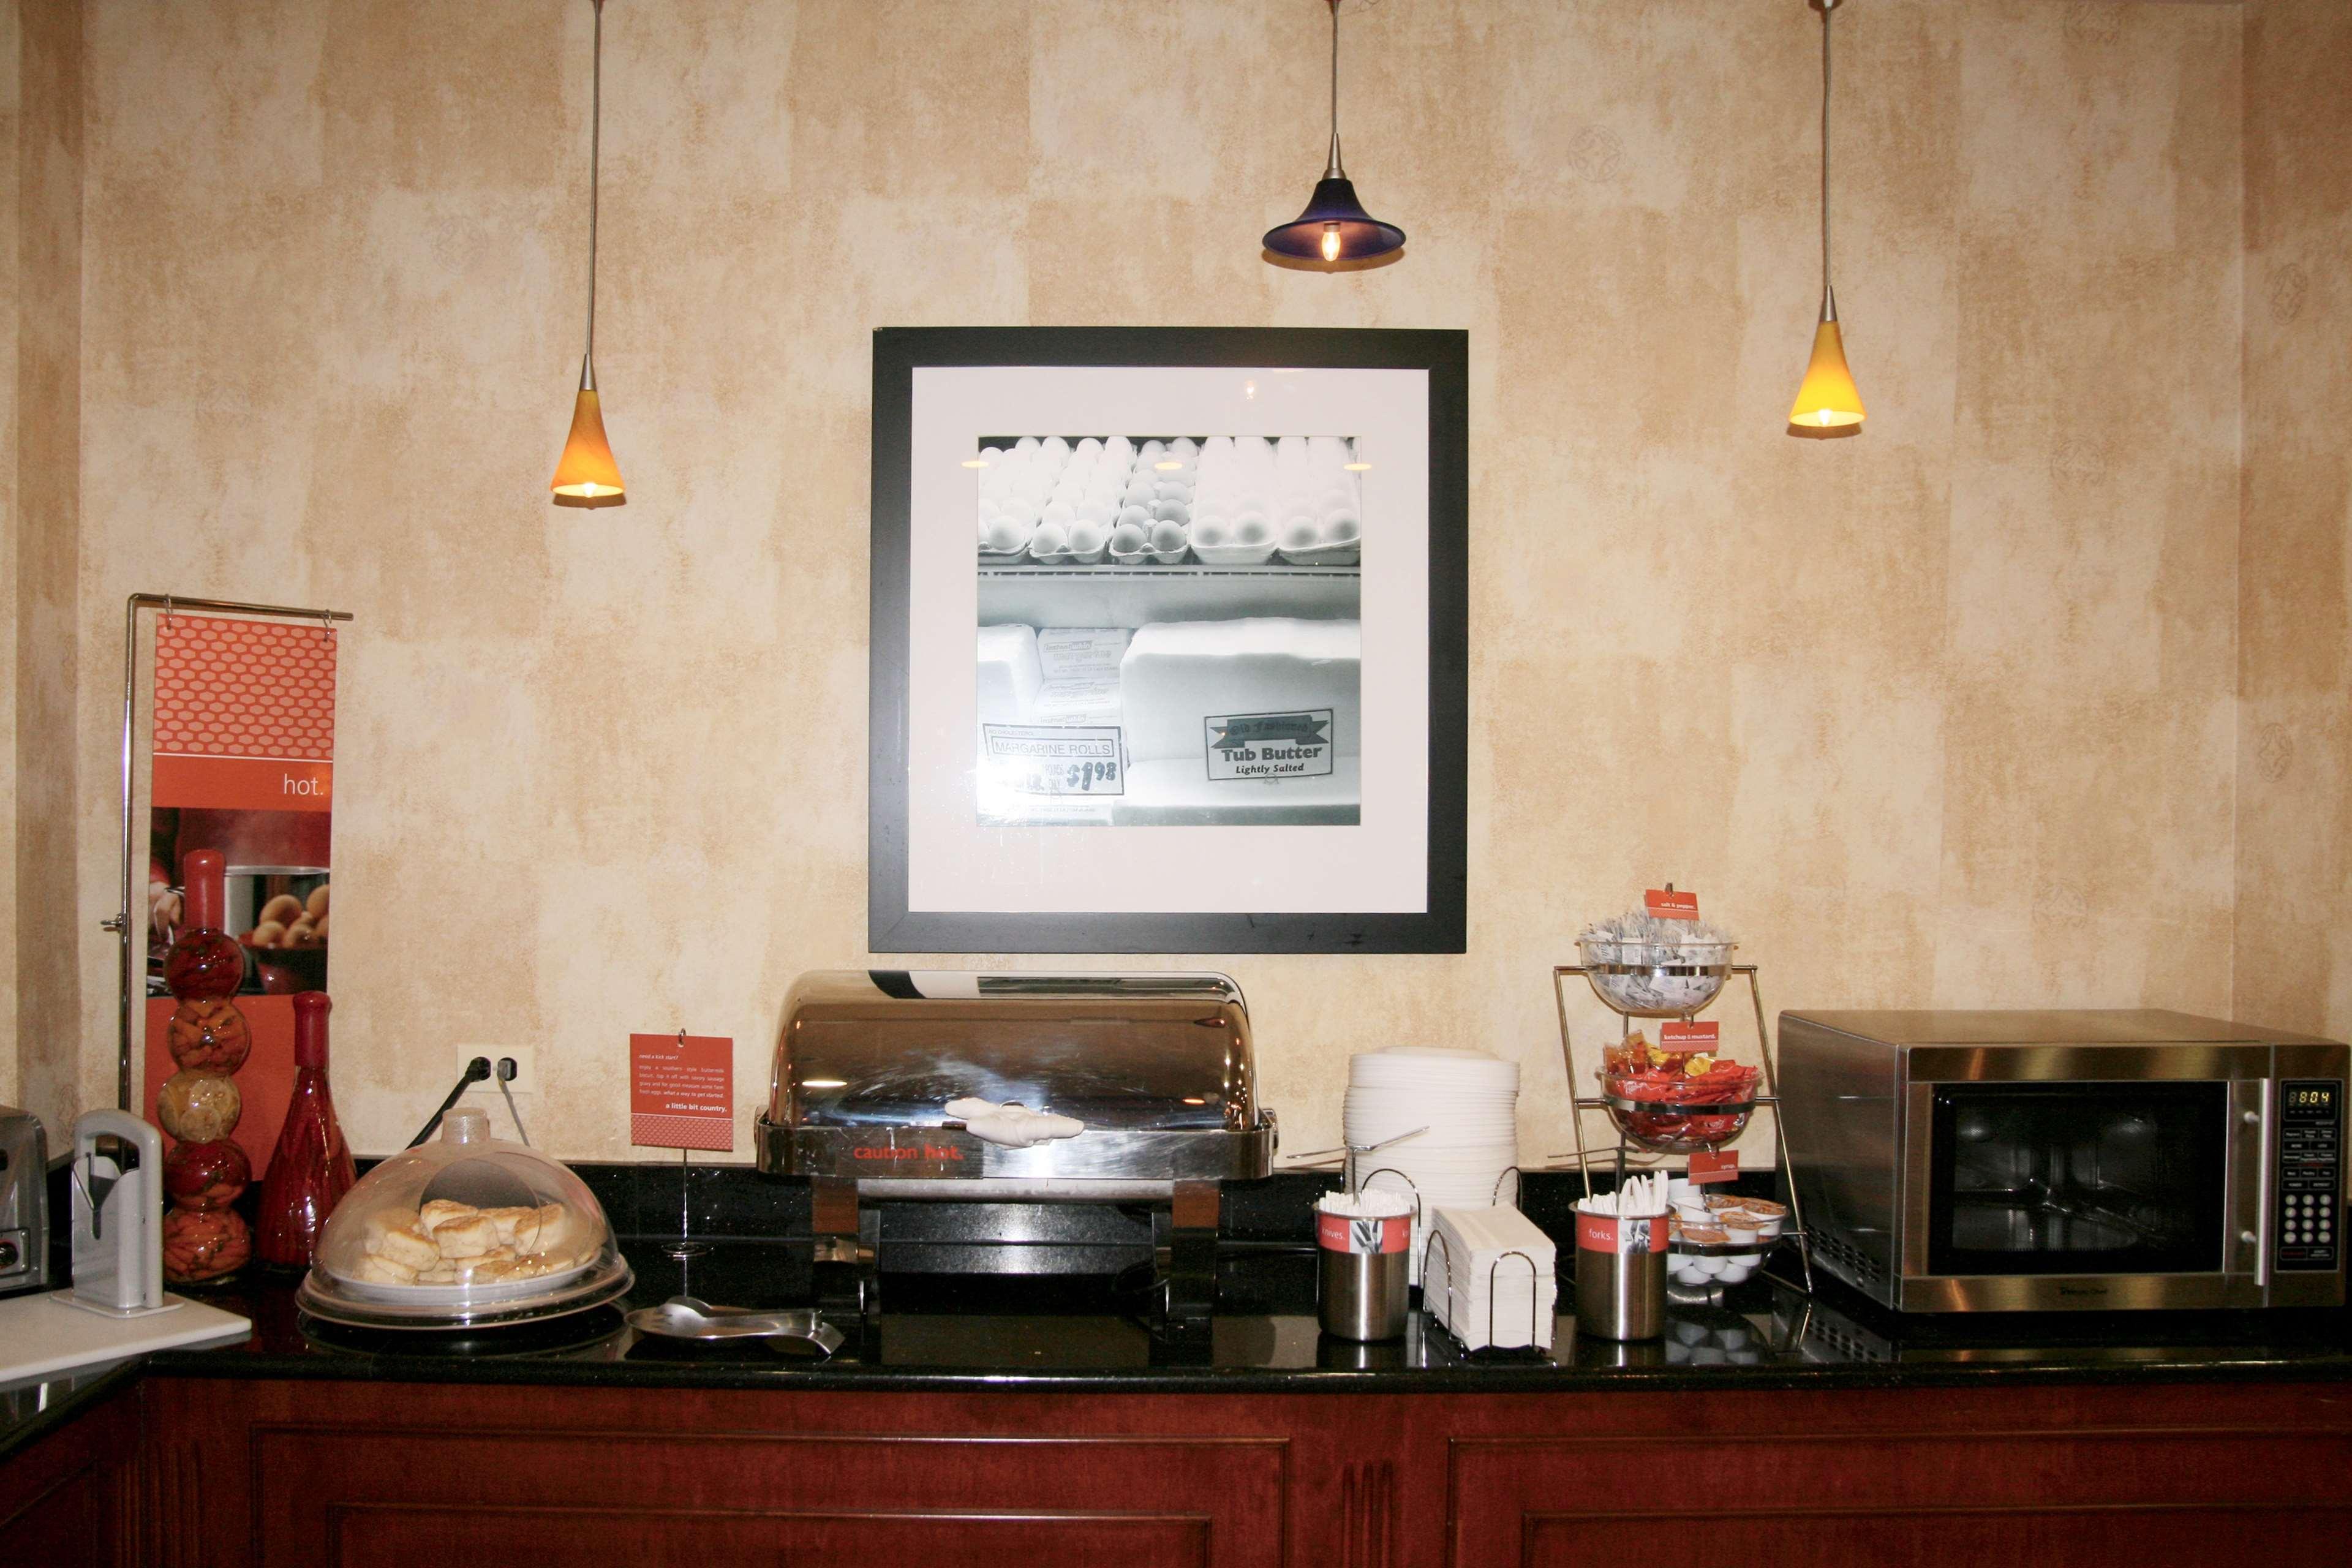 Hampton Inn & Suites Bolingbrook image 8